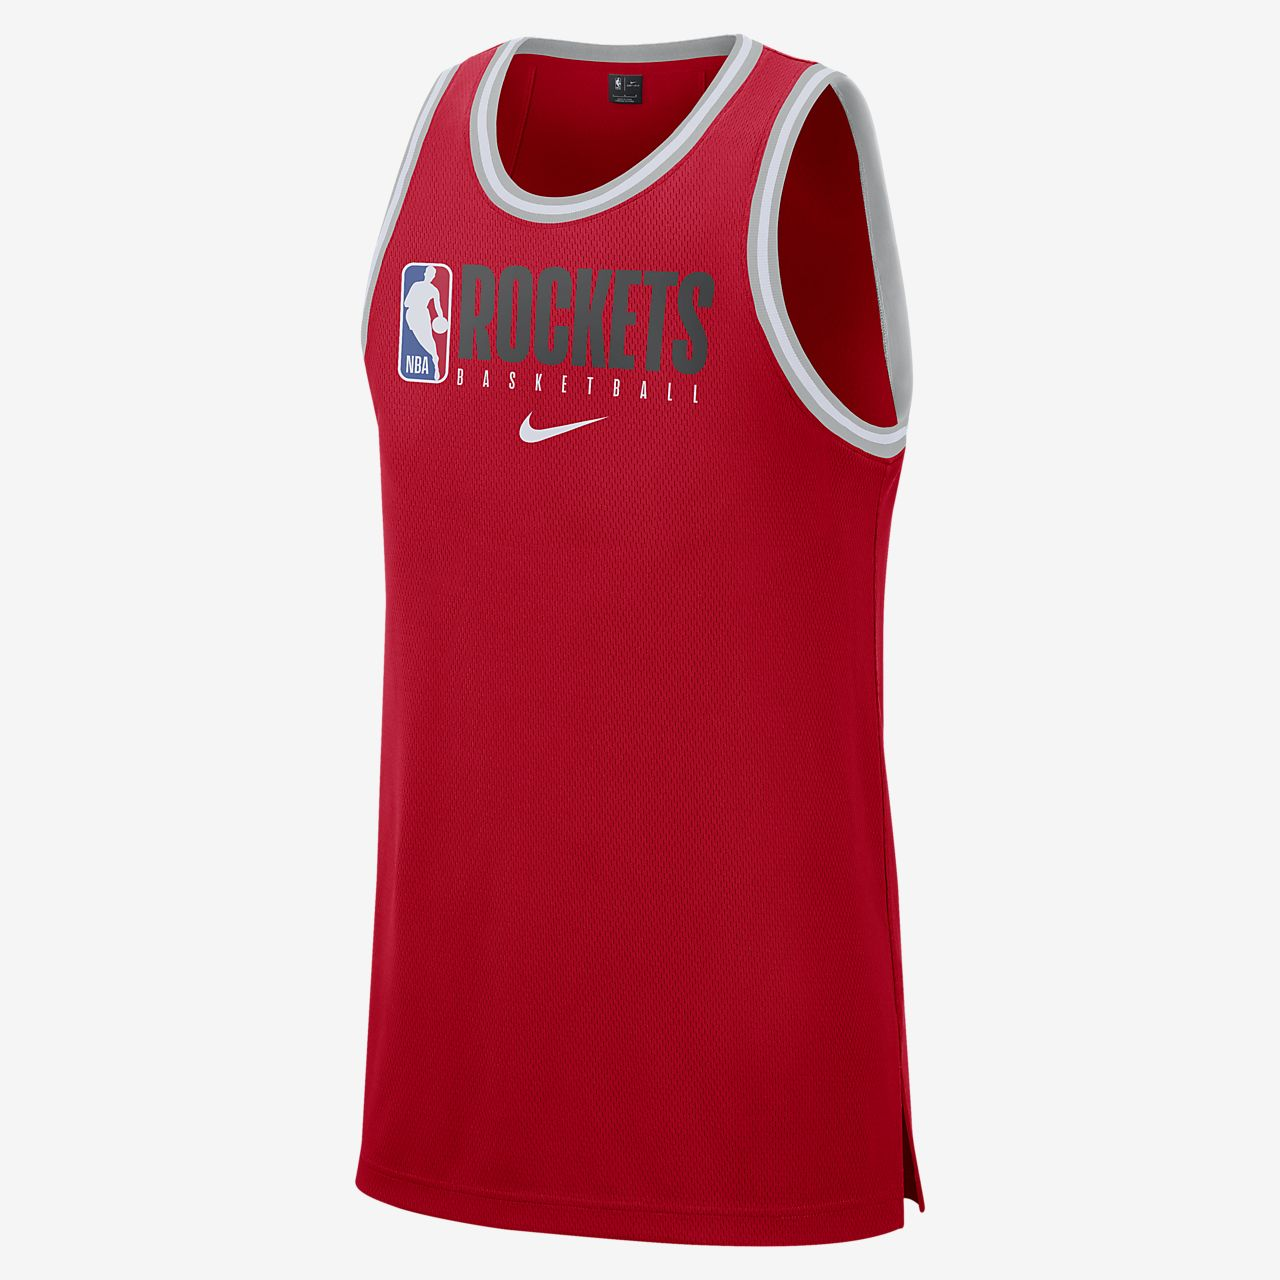 Houston Rockets Nike Dri-FIT NBA-Tanktop für Herren